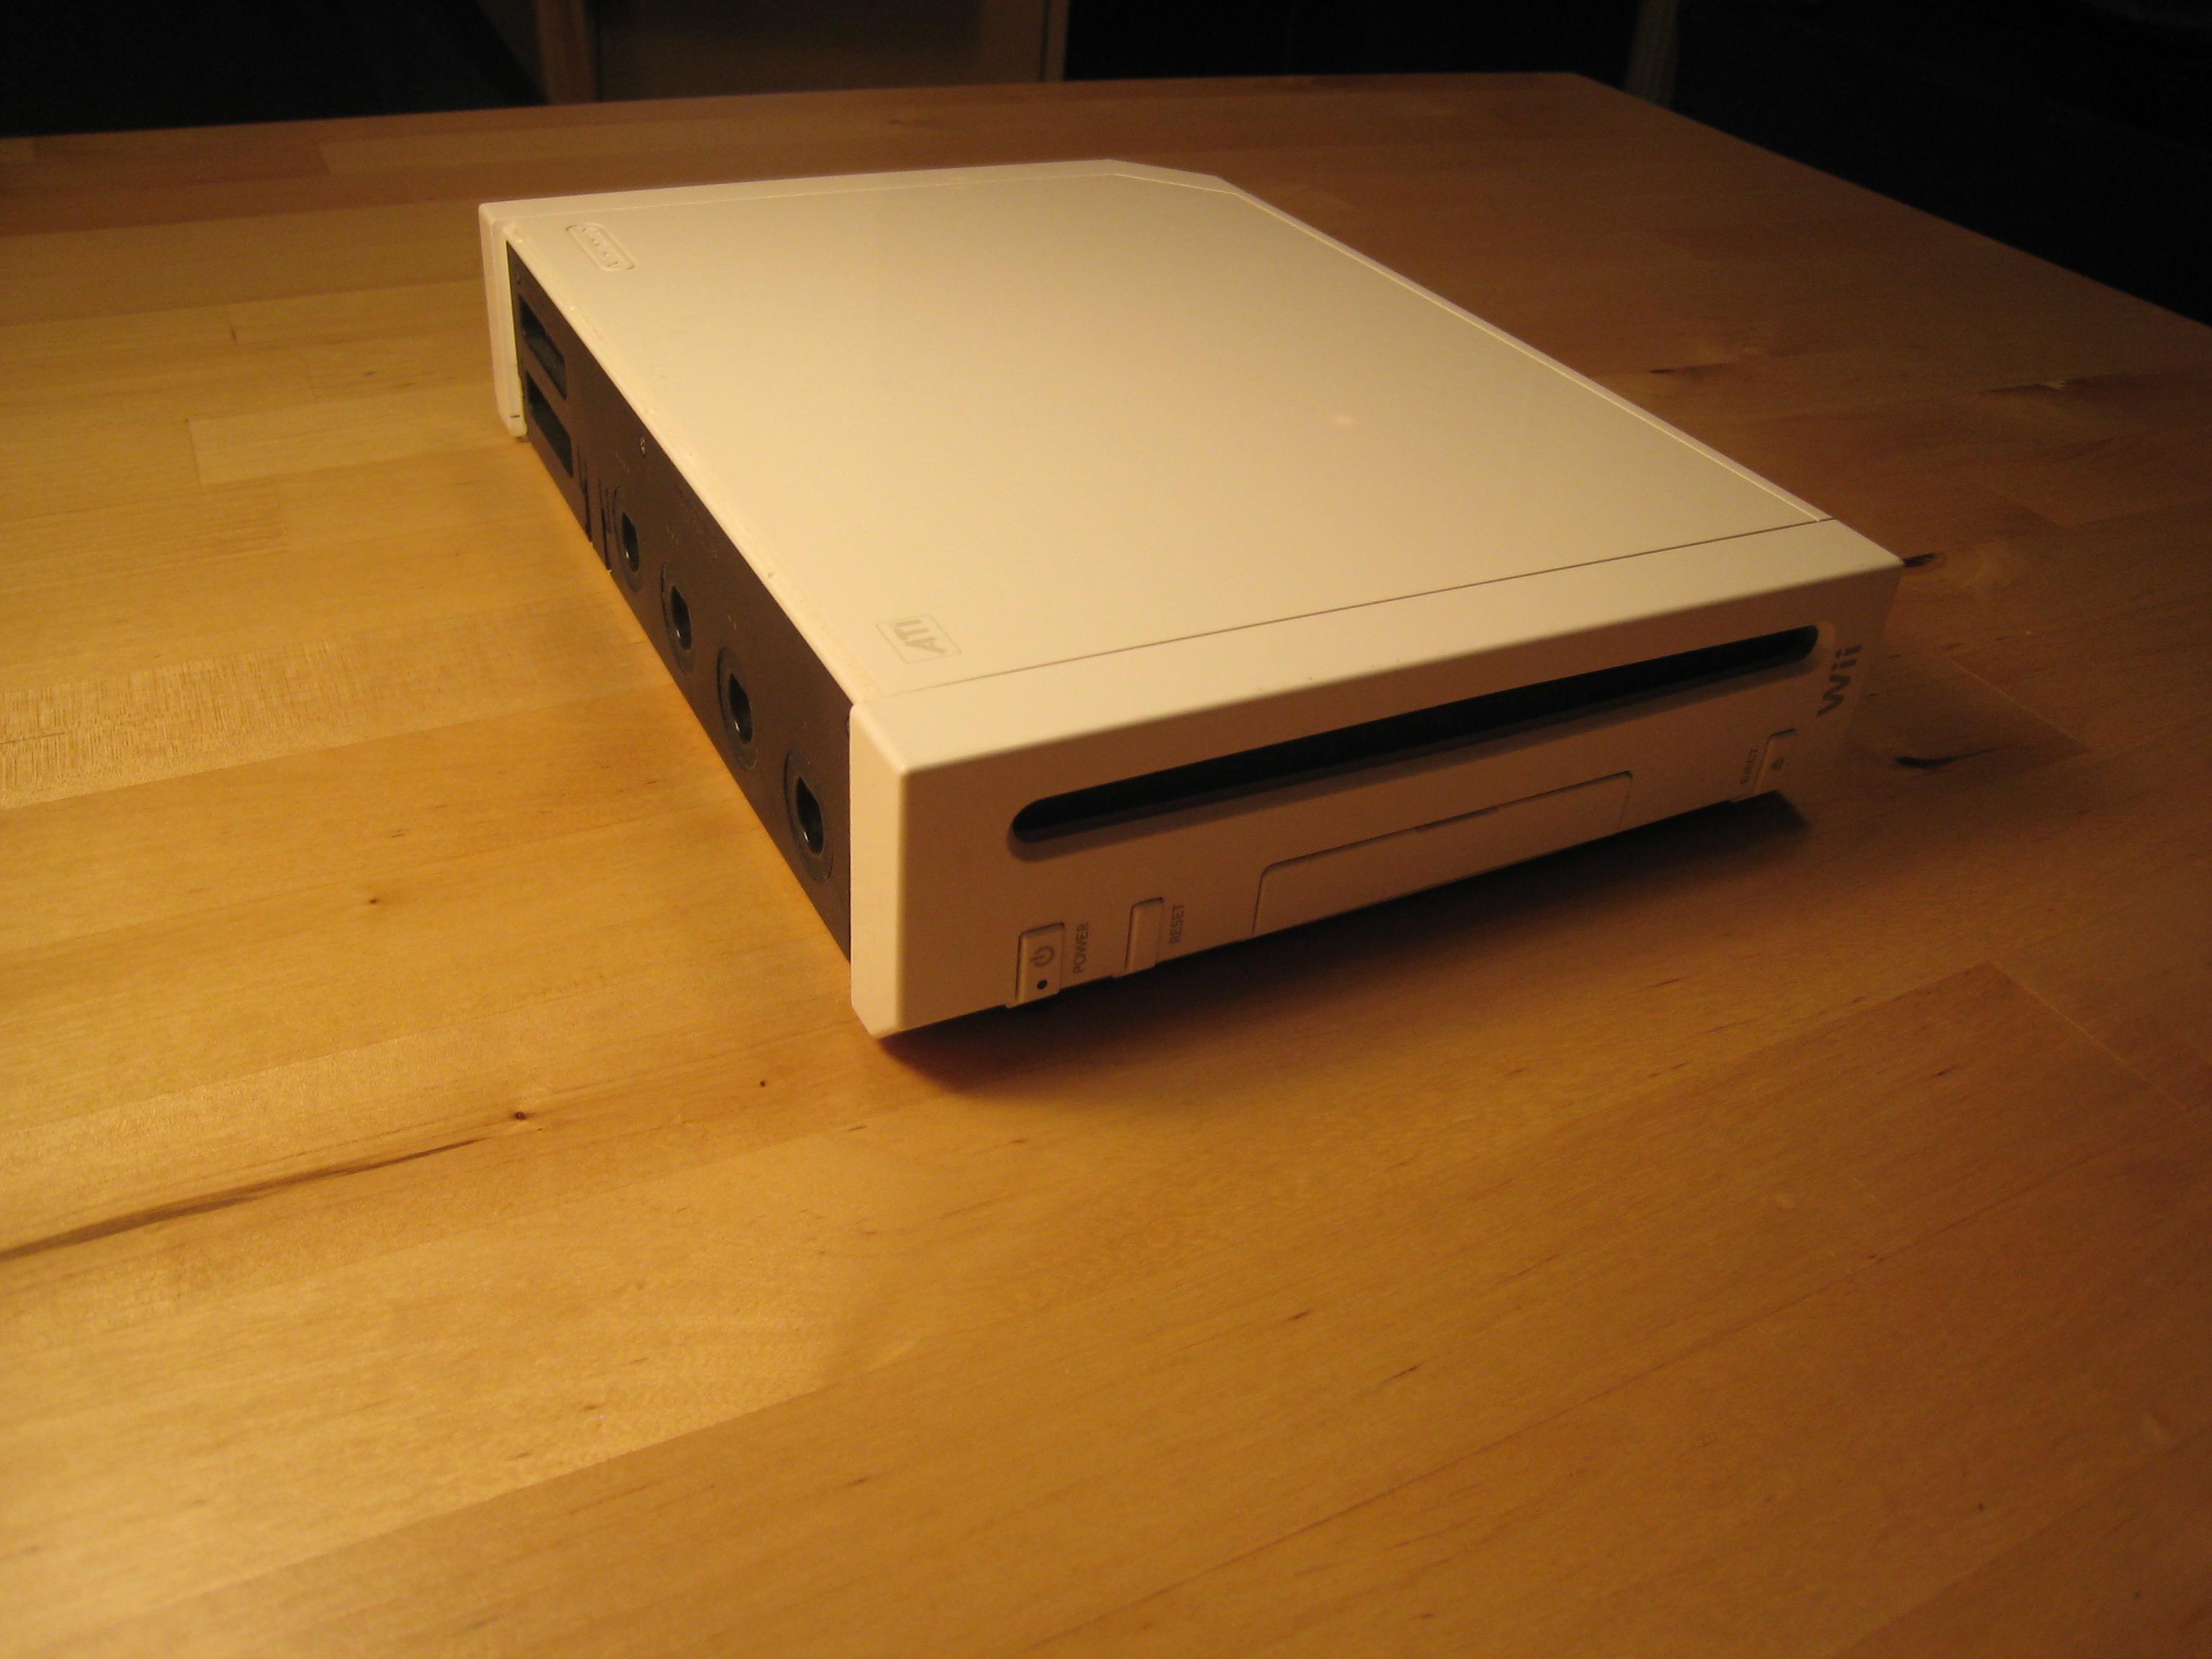 Nintendo Wii Teardown Ifixit Installing Wiring Diagram